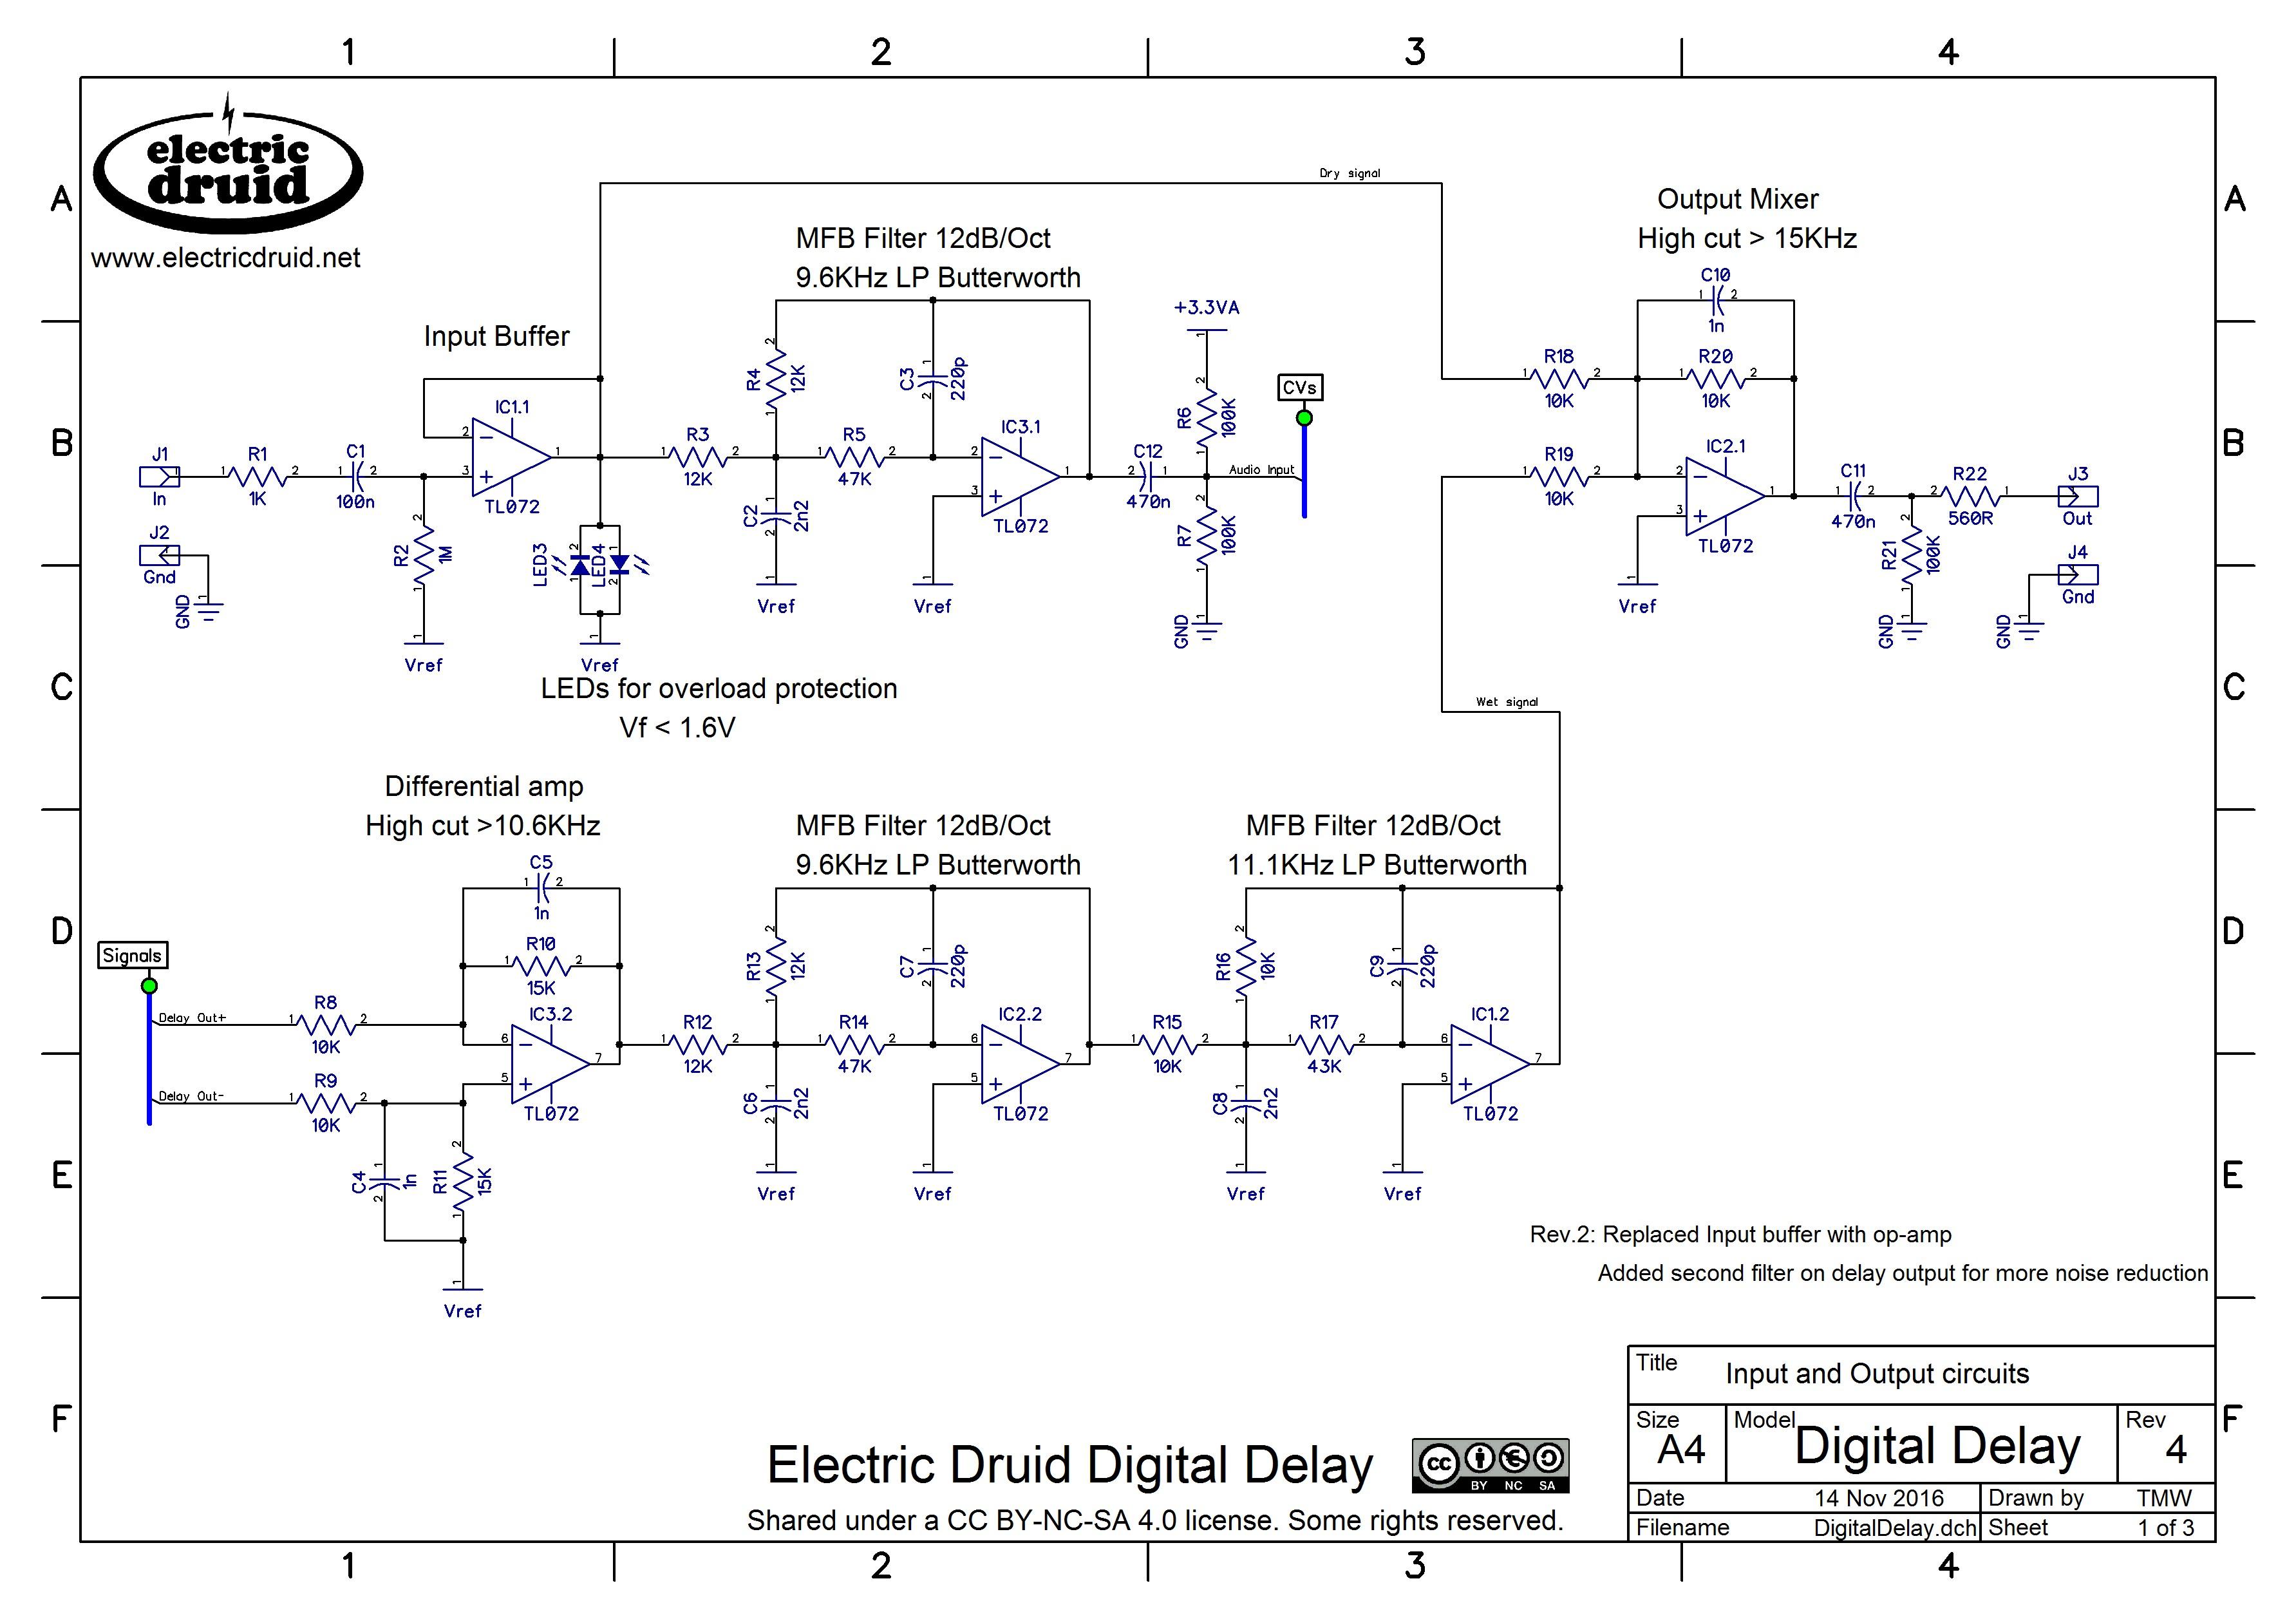 Surprising Diy 4 Second Digital Delay Electric Druid Wiring Cloud Loplapiotaidewilluminateatxorg